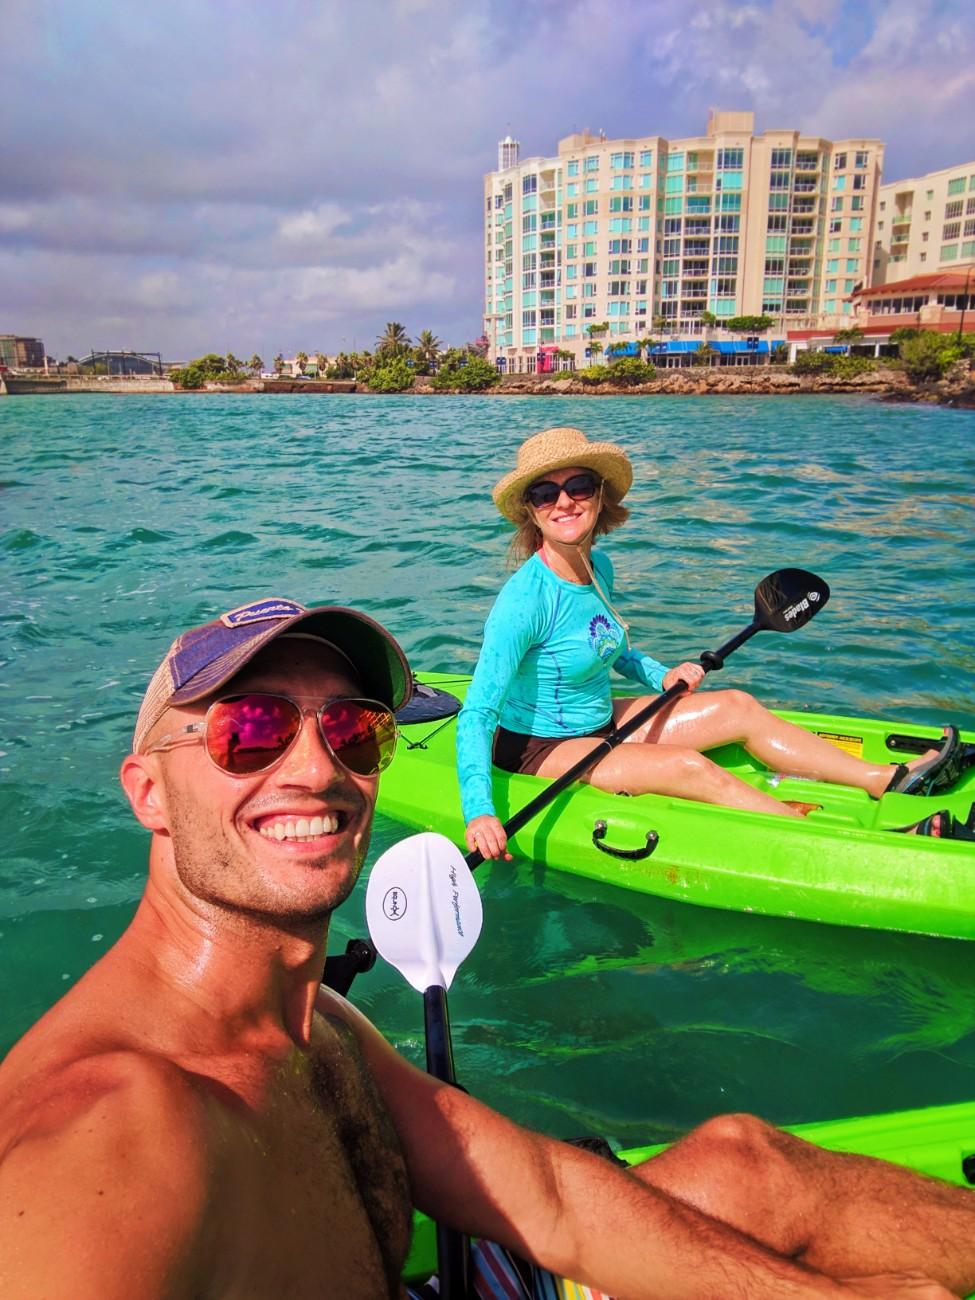 Rob and Maureen Kayaking on Laguna Condado San Juan Puerto Rico 2